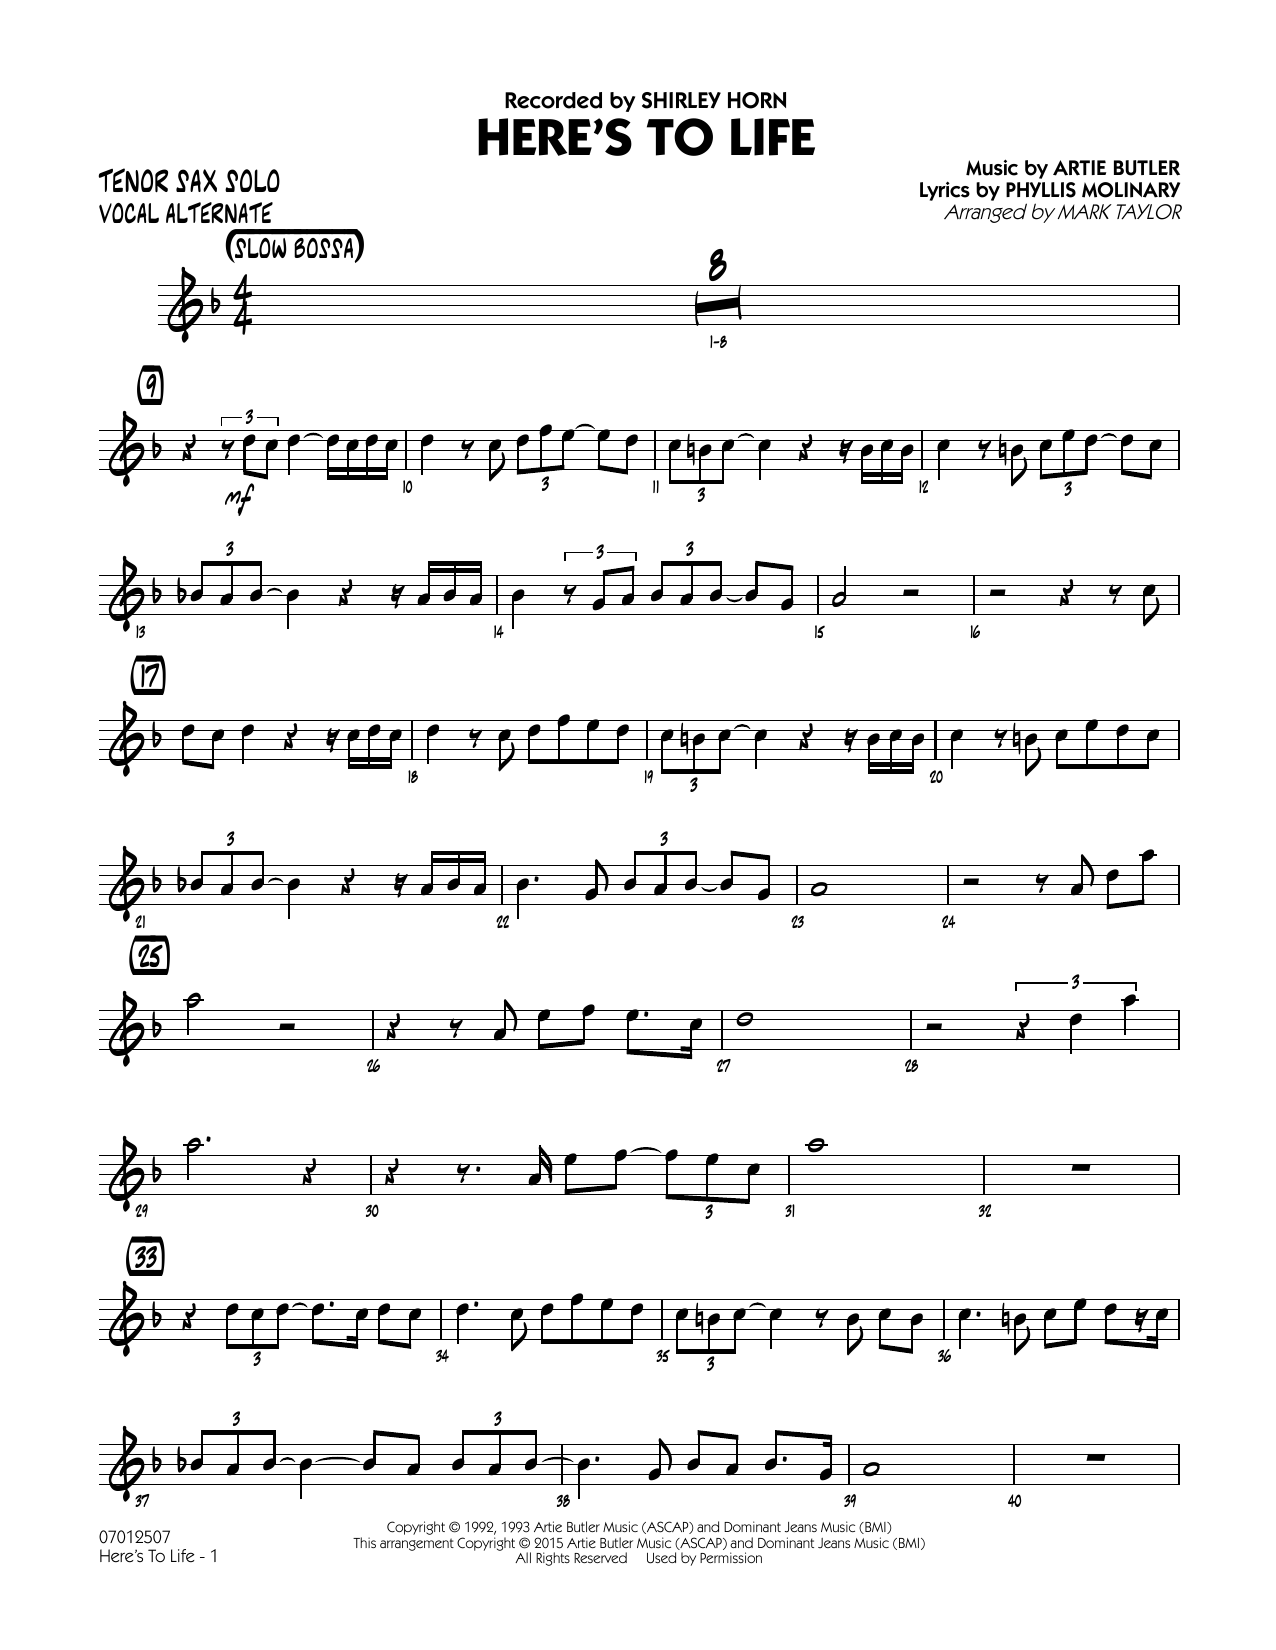 Here's To Life (Key: C minor) - Tenor Sax Solo (Vocal Alt) (Jazz Ensemble)